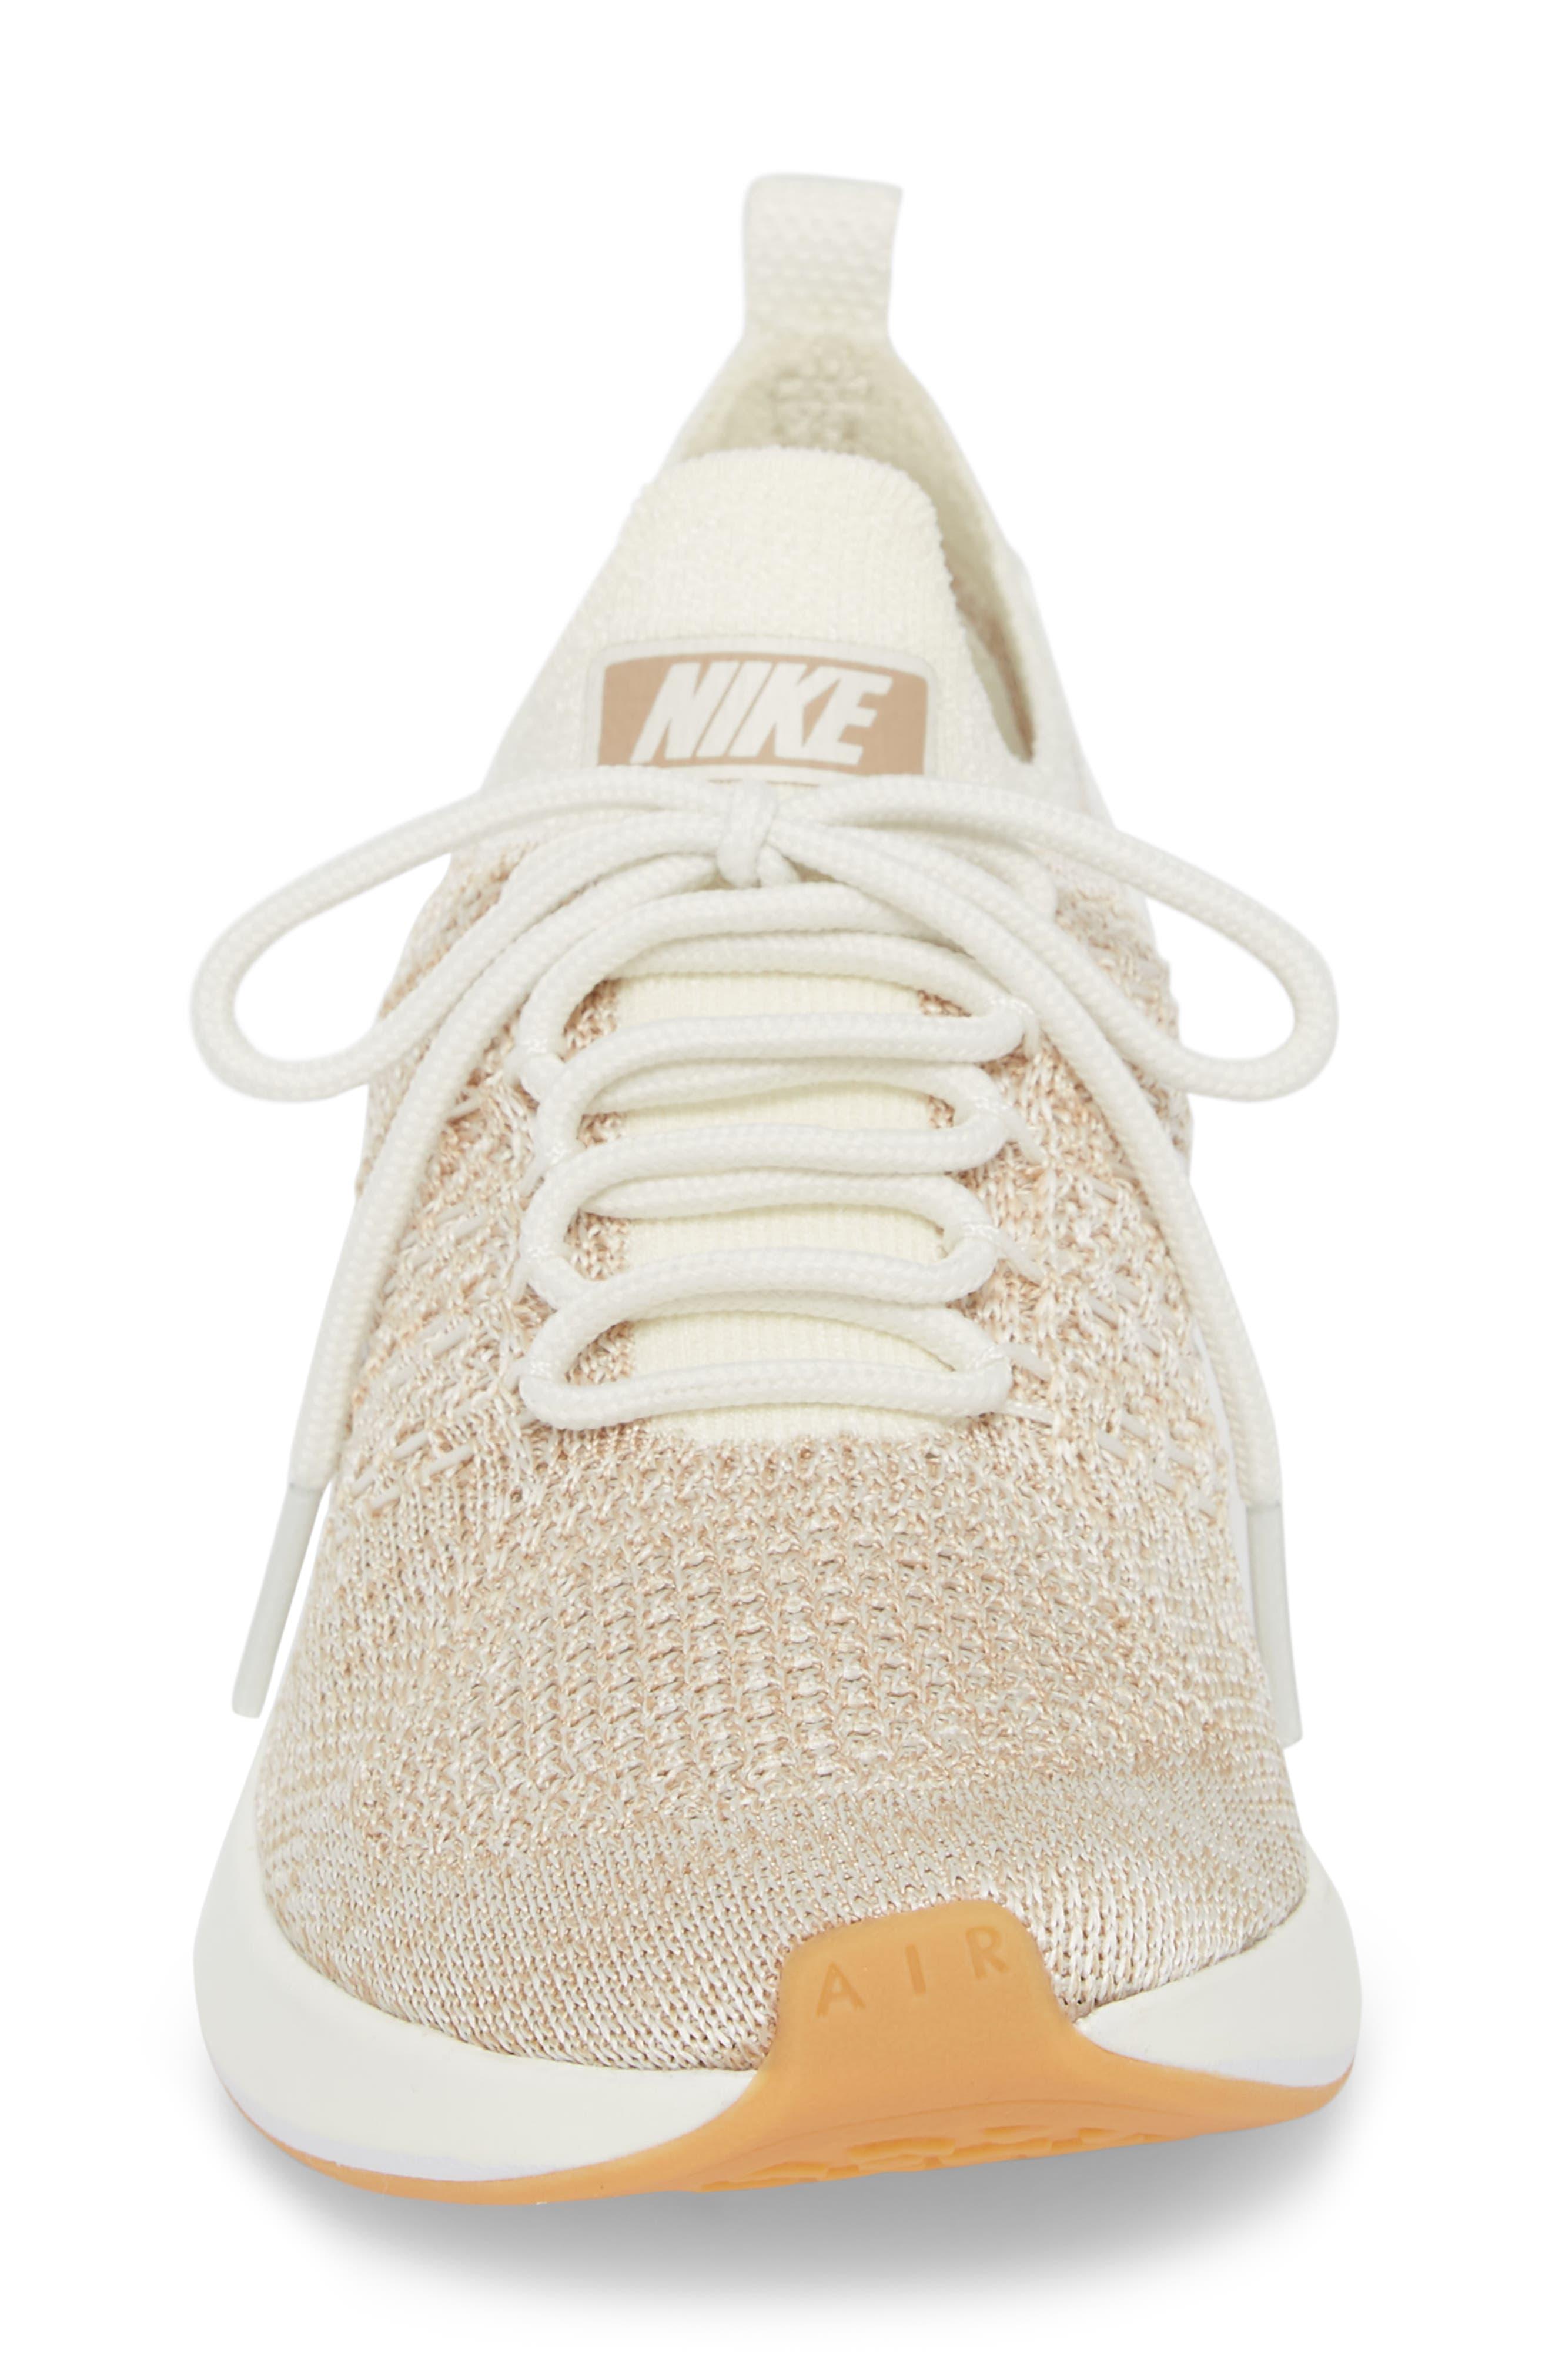 Air Zoom Mariah Flyknit Racer Sneaker,                             Alternate thumbnail 4, color,                             Sail/ White/ Sand